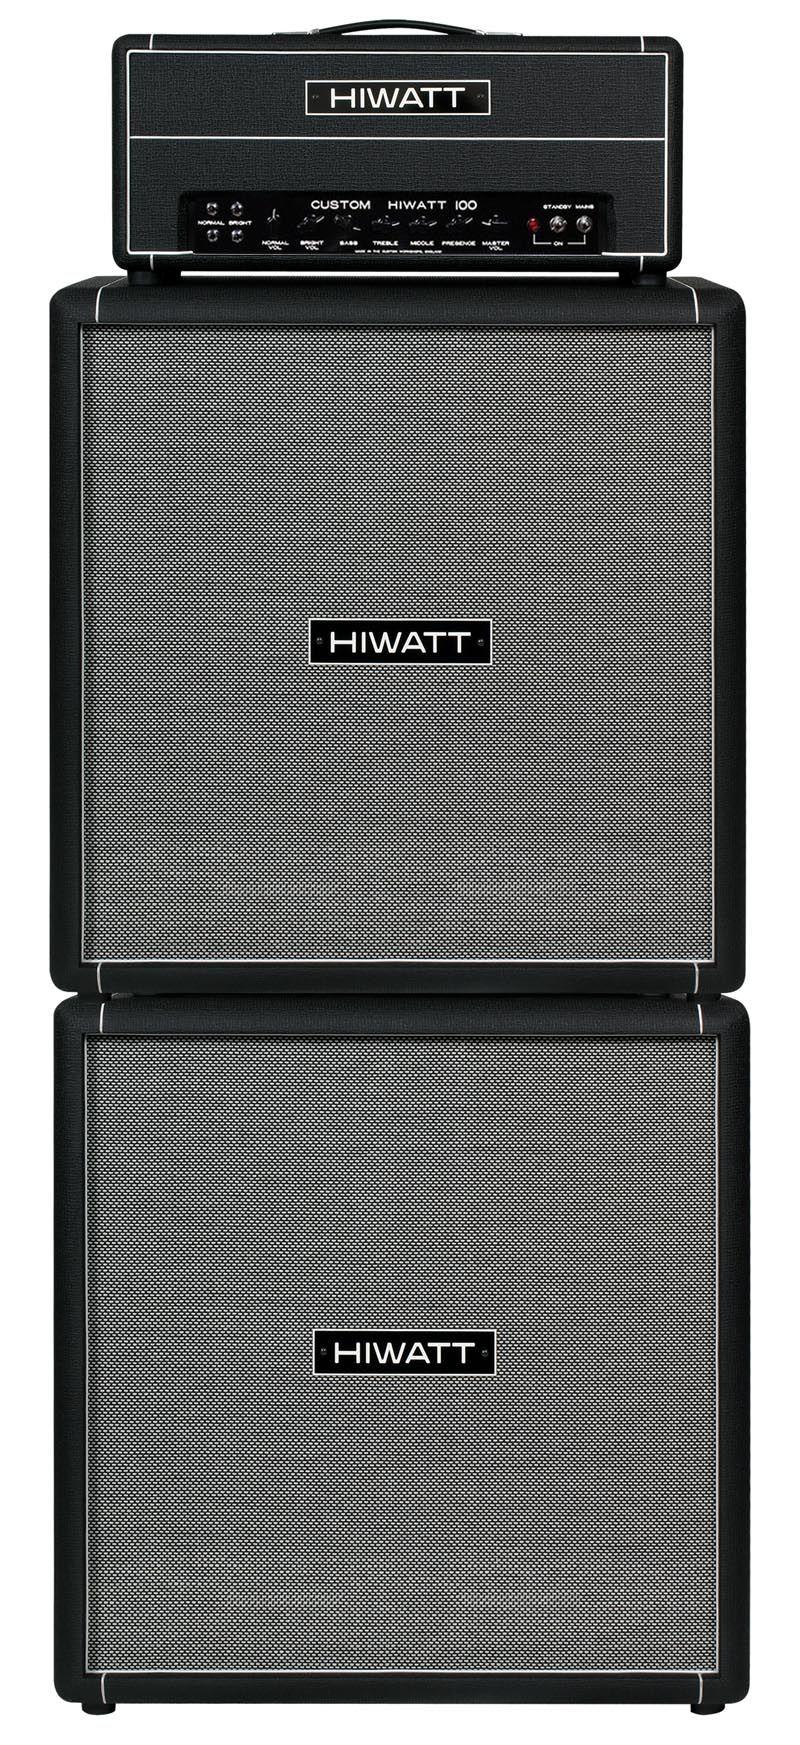 HIWATT Custom Hiwatt 100